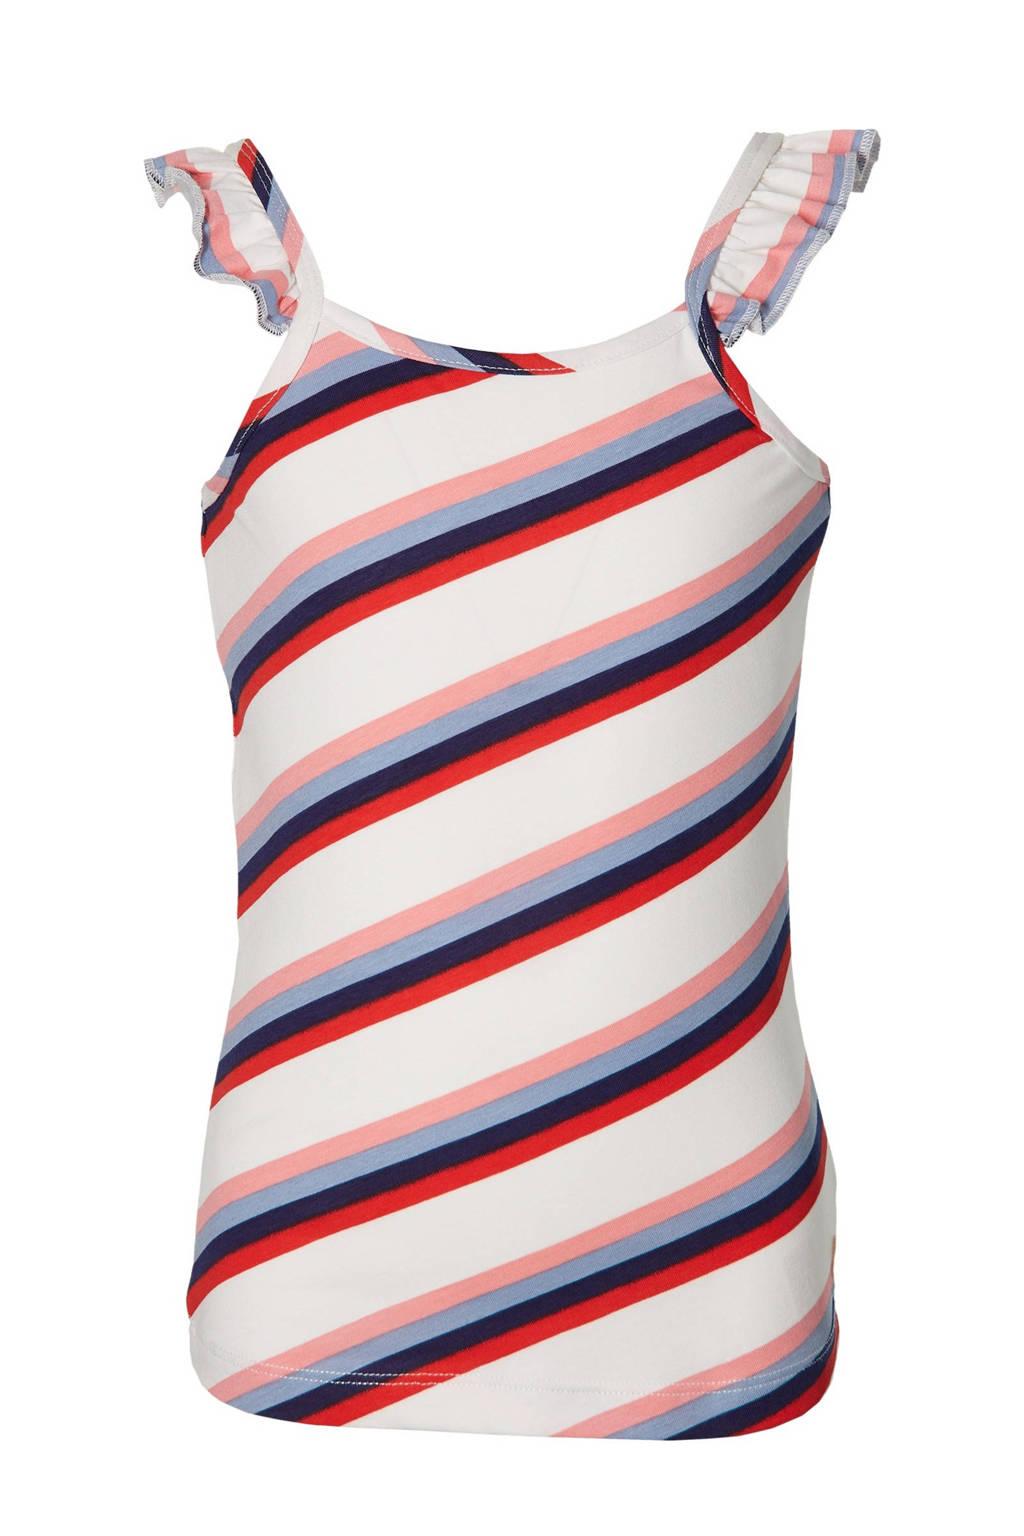 Quapi Girls gestreepte singlet Feden wit/roze/donkerblauw, Wit/roze/donkerblauw